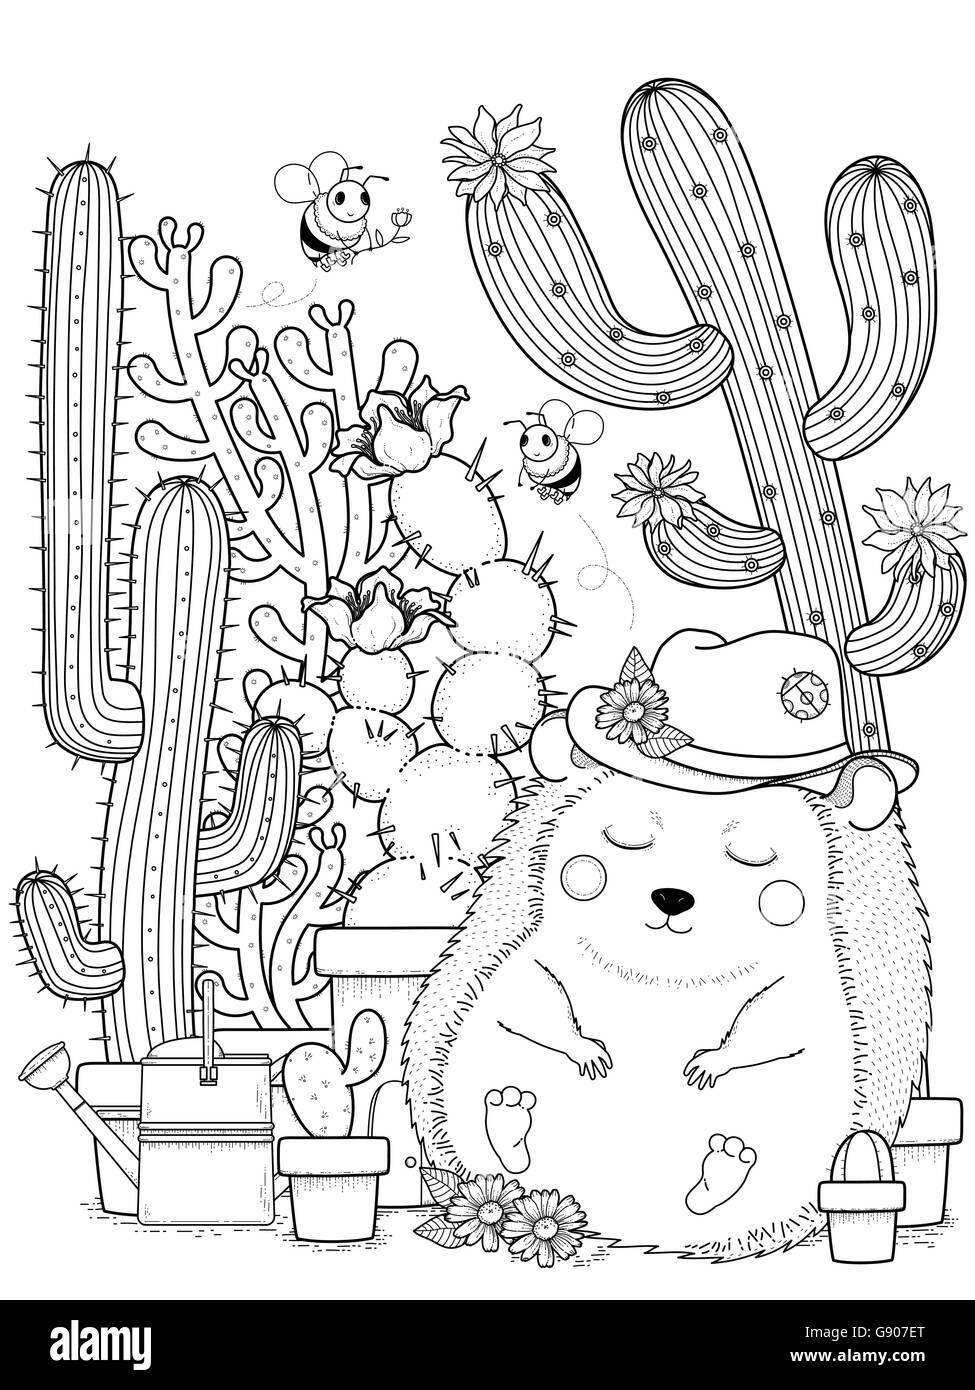 Cactus Friend Stock Photos Cactus Friend Stock Images Alamy